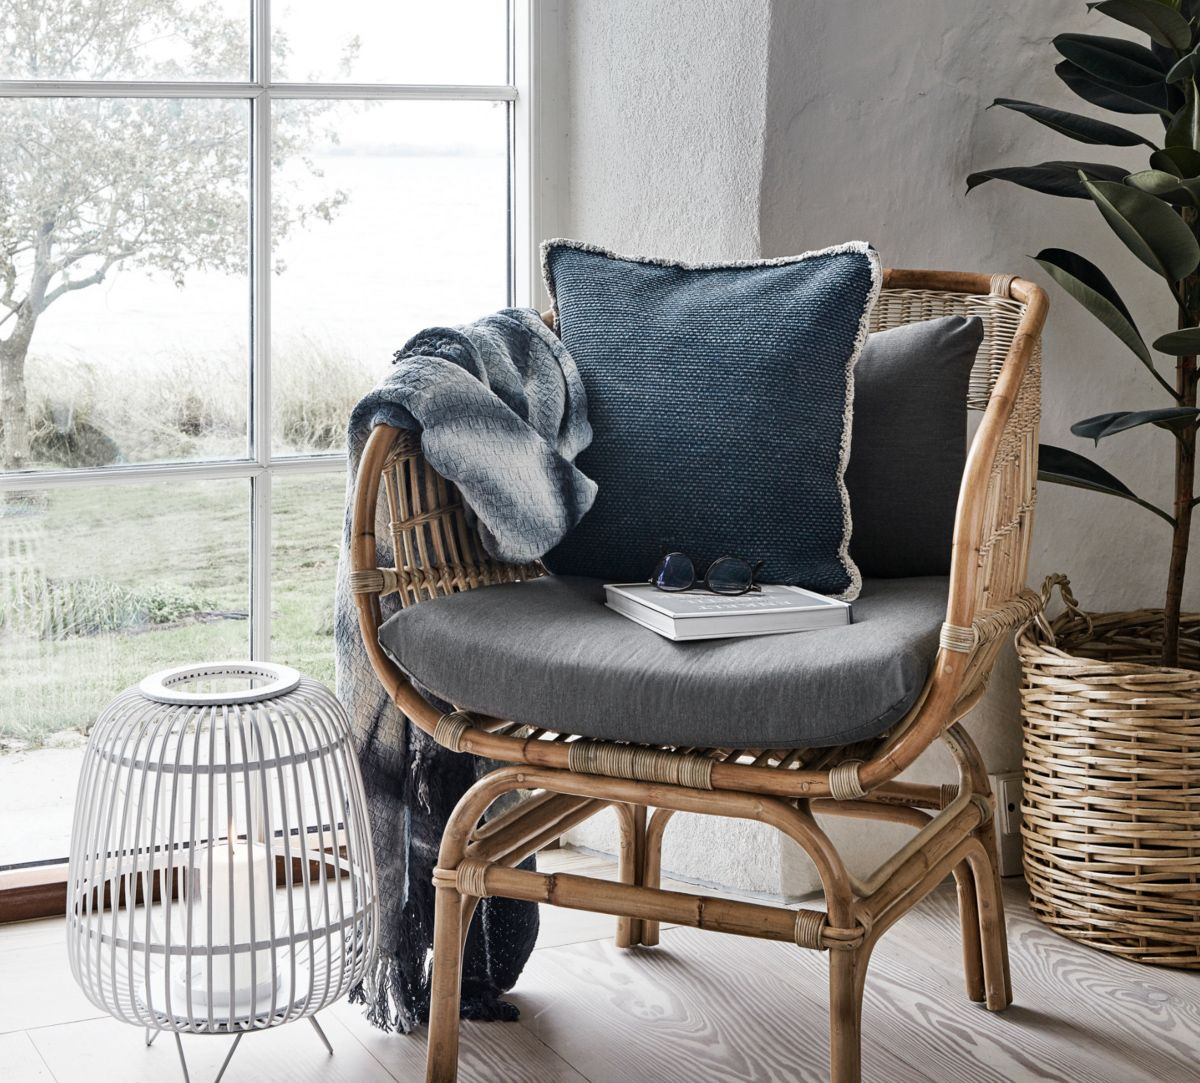 sitzkissen rattanstuhl 2x rattansessel inkl sitzkissen relaxsessel korbsessel sessel. Black Bedroom Furniture Sets. Home Design Ideas